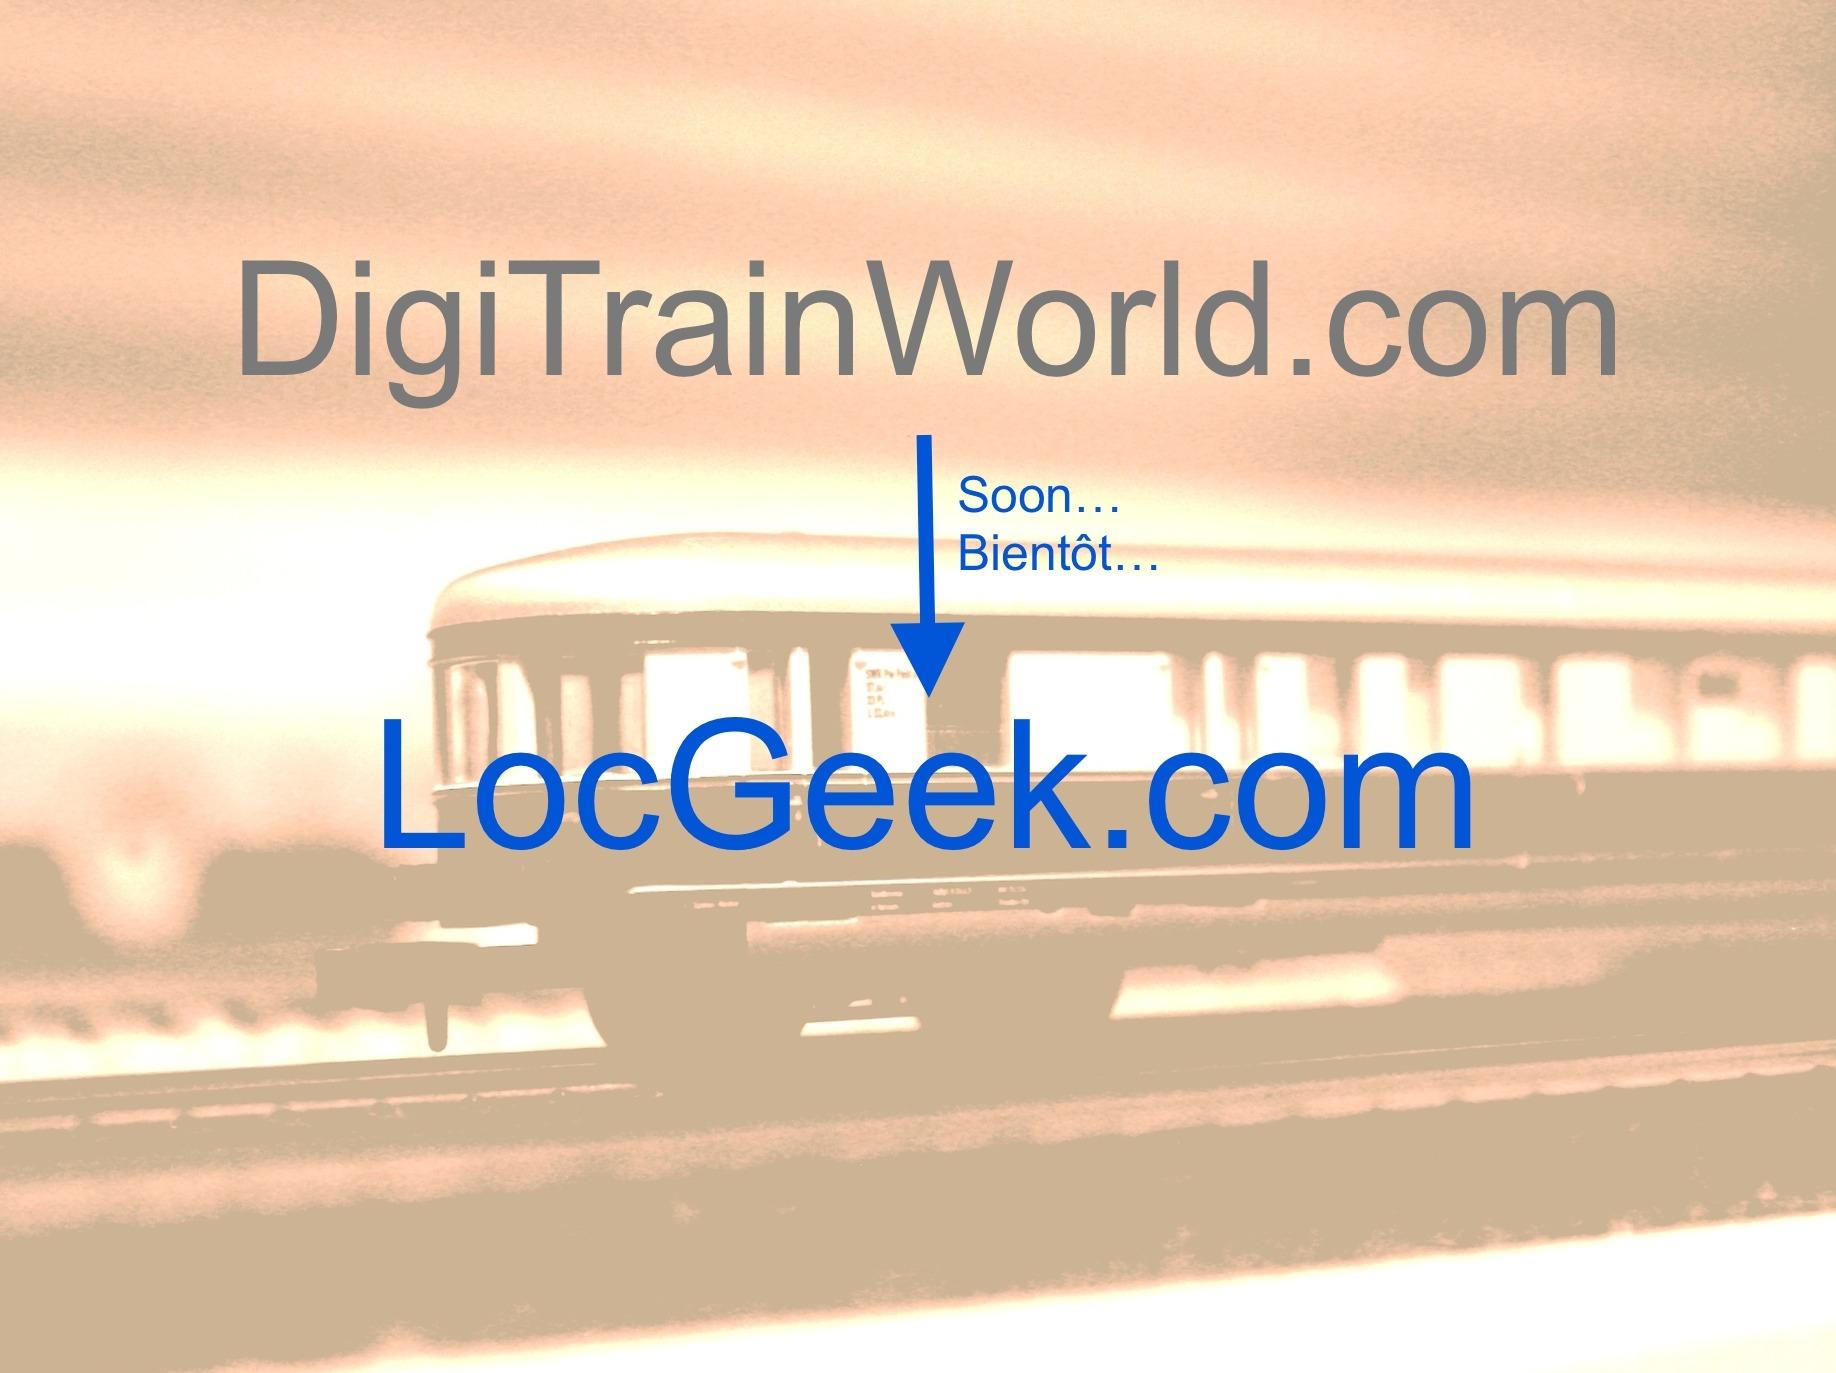 DigiTrainWorld is now LocGeek.com!